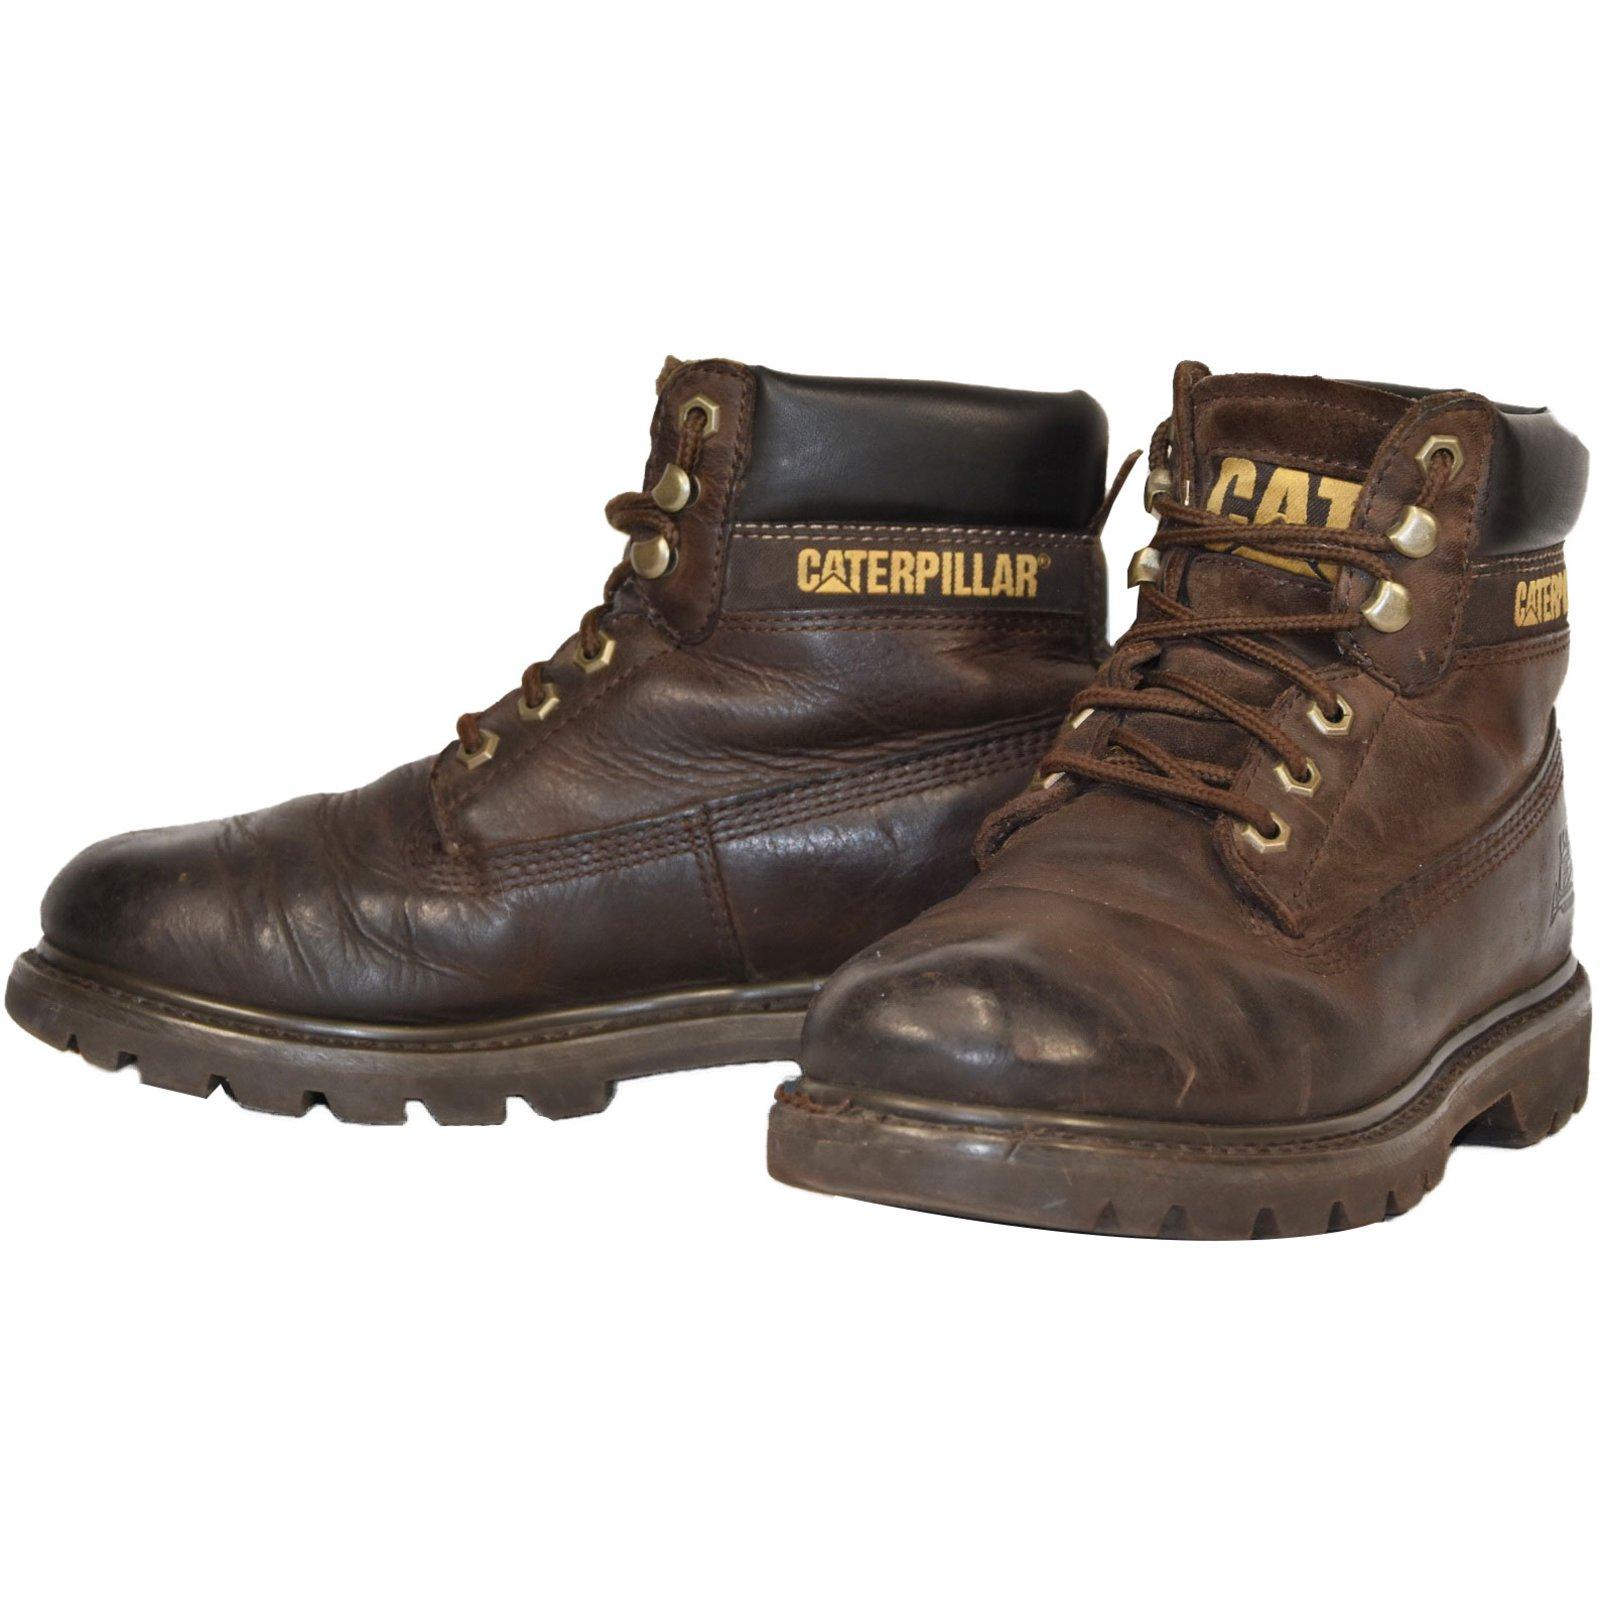 bottes boots autre marque bottines caterpillar colorado shukka homme uk 6 cuir marron. Black Bedroom Furniture Sets. Home Design Ideas